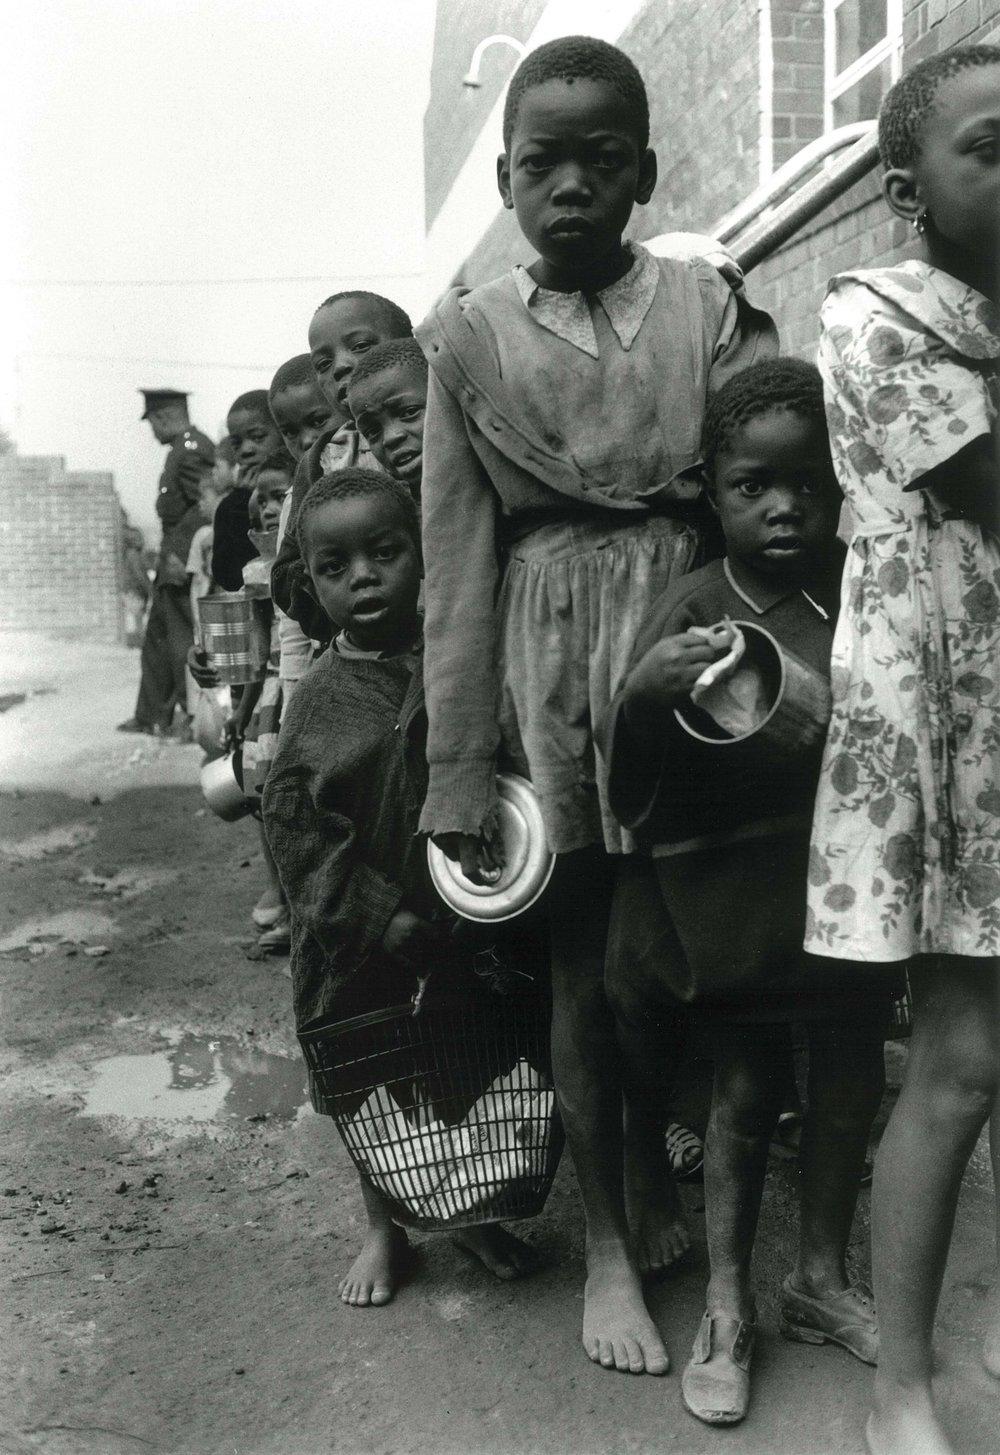 1962 – South African Children's feeding scheme, Orlando township, The scheme was a charity sponsored by wealthy white women.   Courtesy of the Estate of John Goldblatt